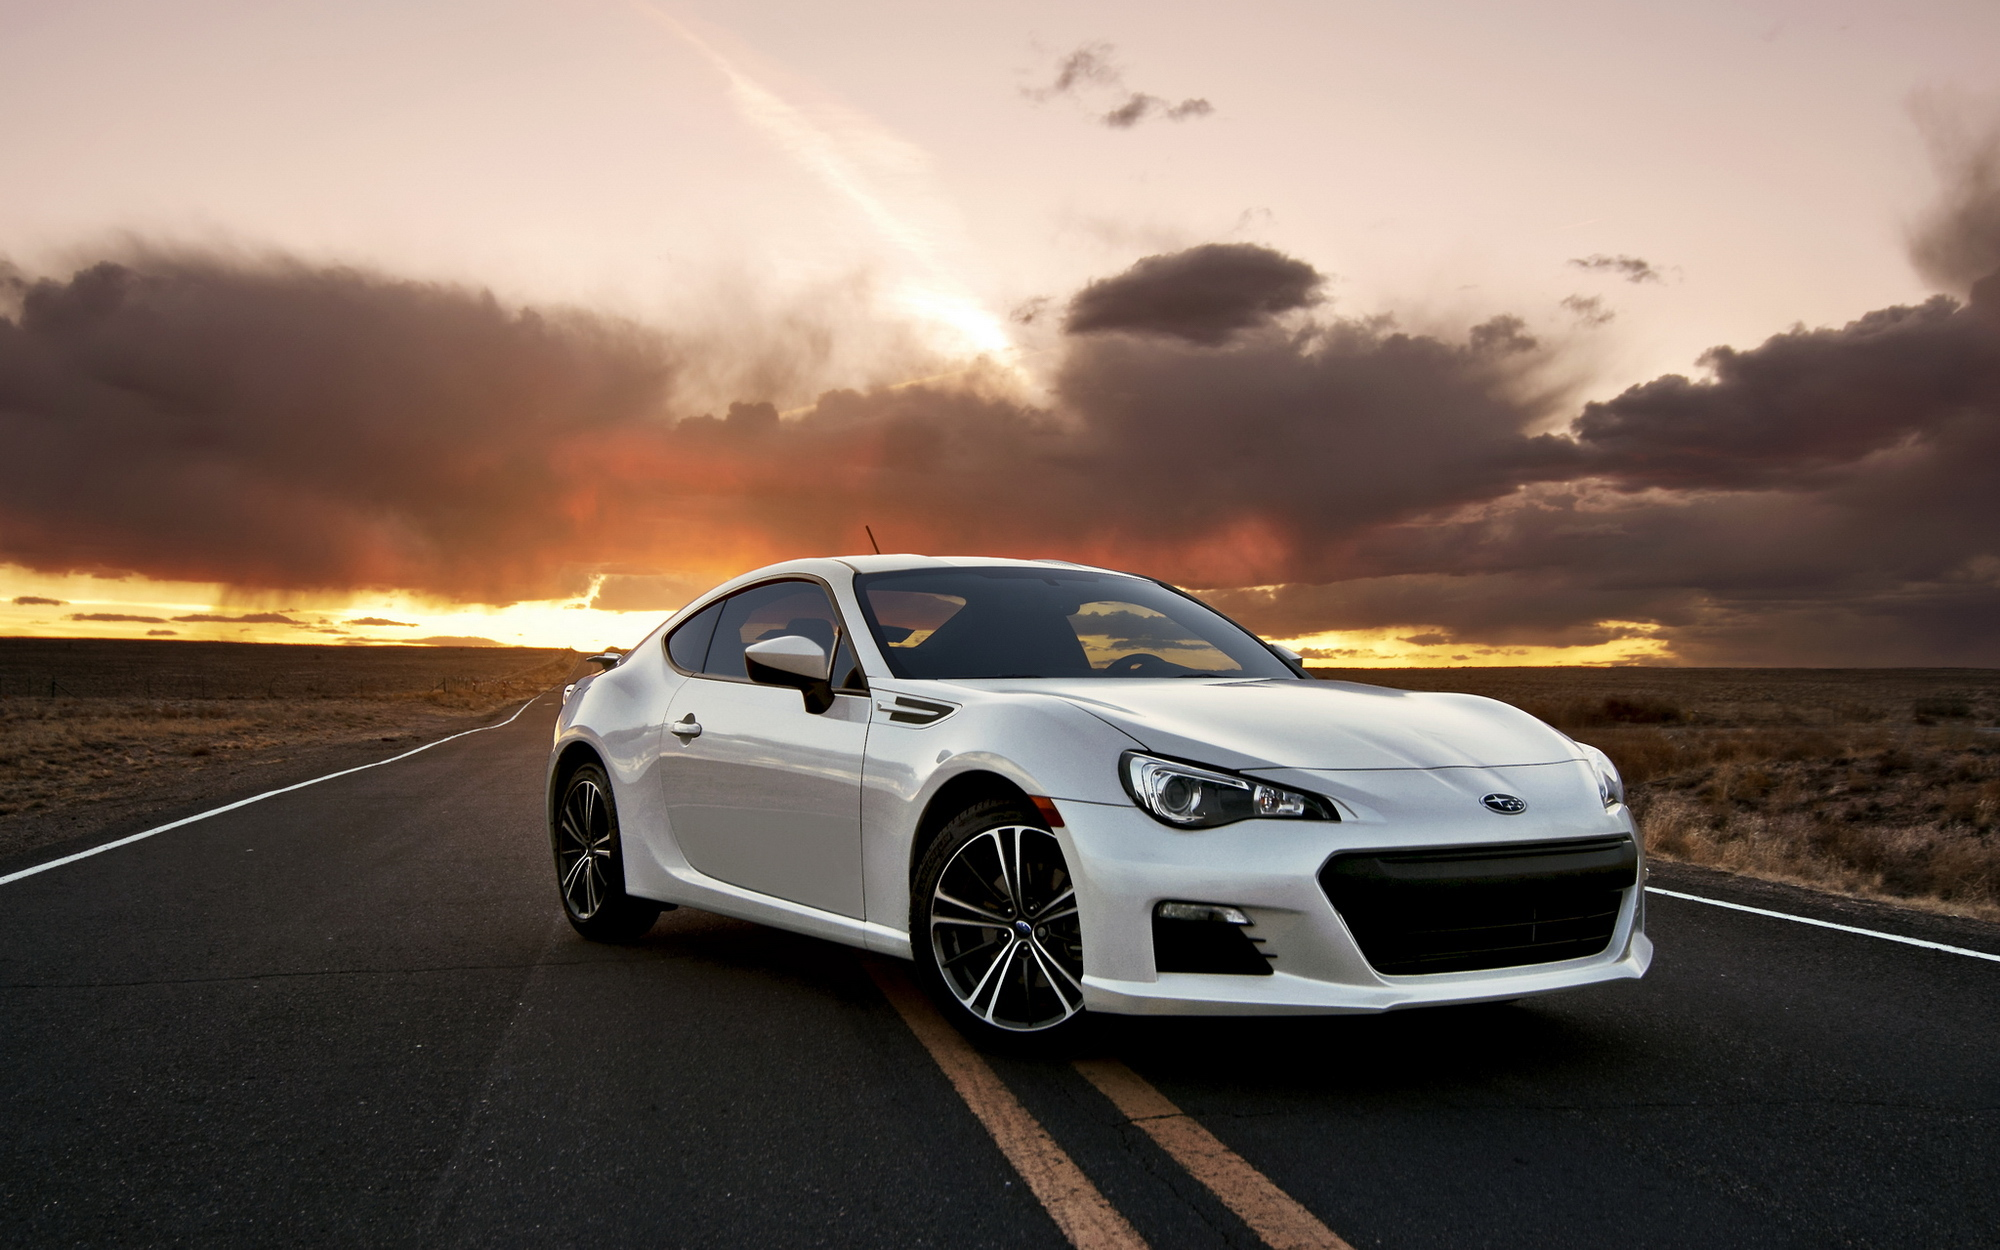 98025 download wallpaper Cars, Subaru Brz, Subaru, Auto, Road screensavers and pictures for free